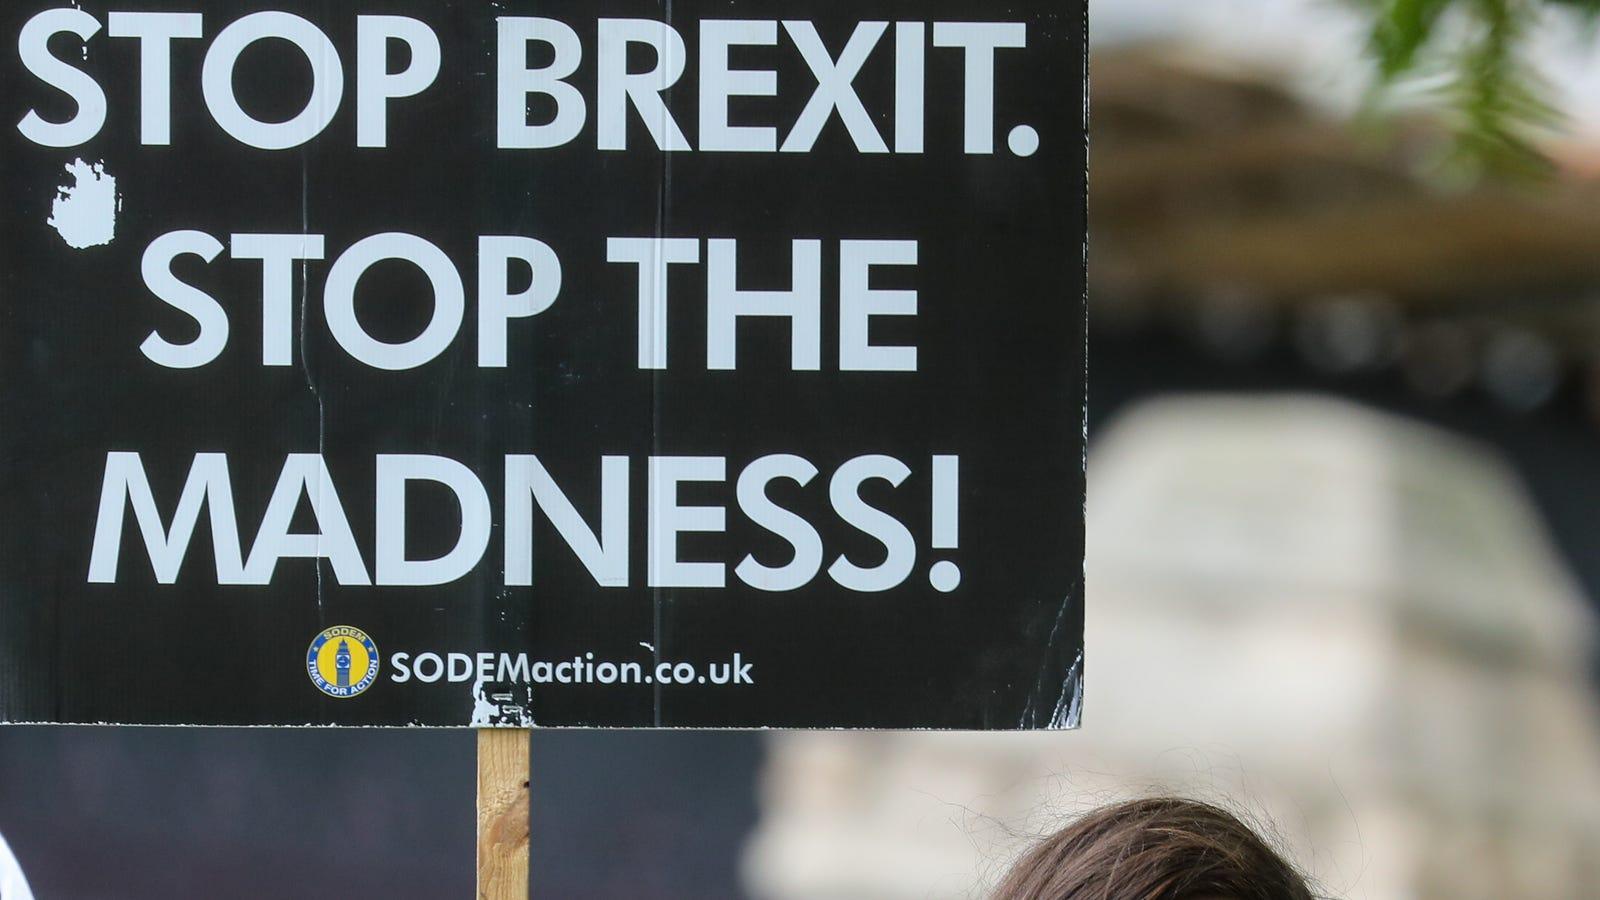 Brexit Sparked a UK Man's Psychotic Episode, Doctors Say